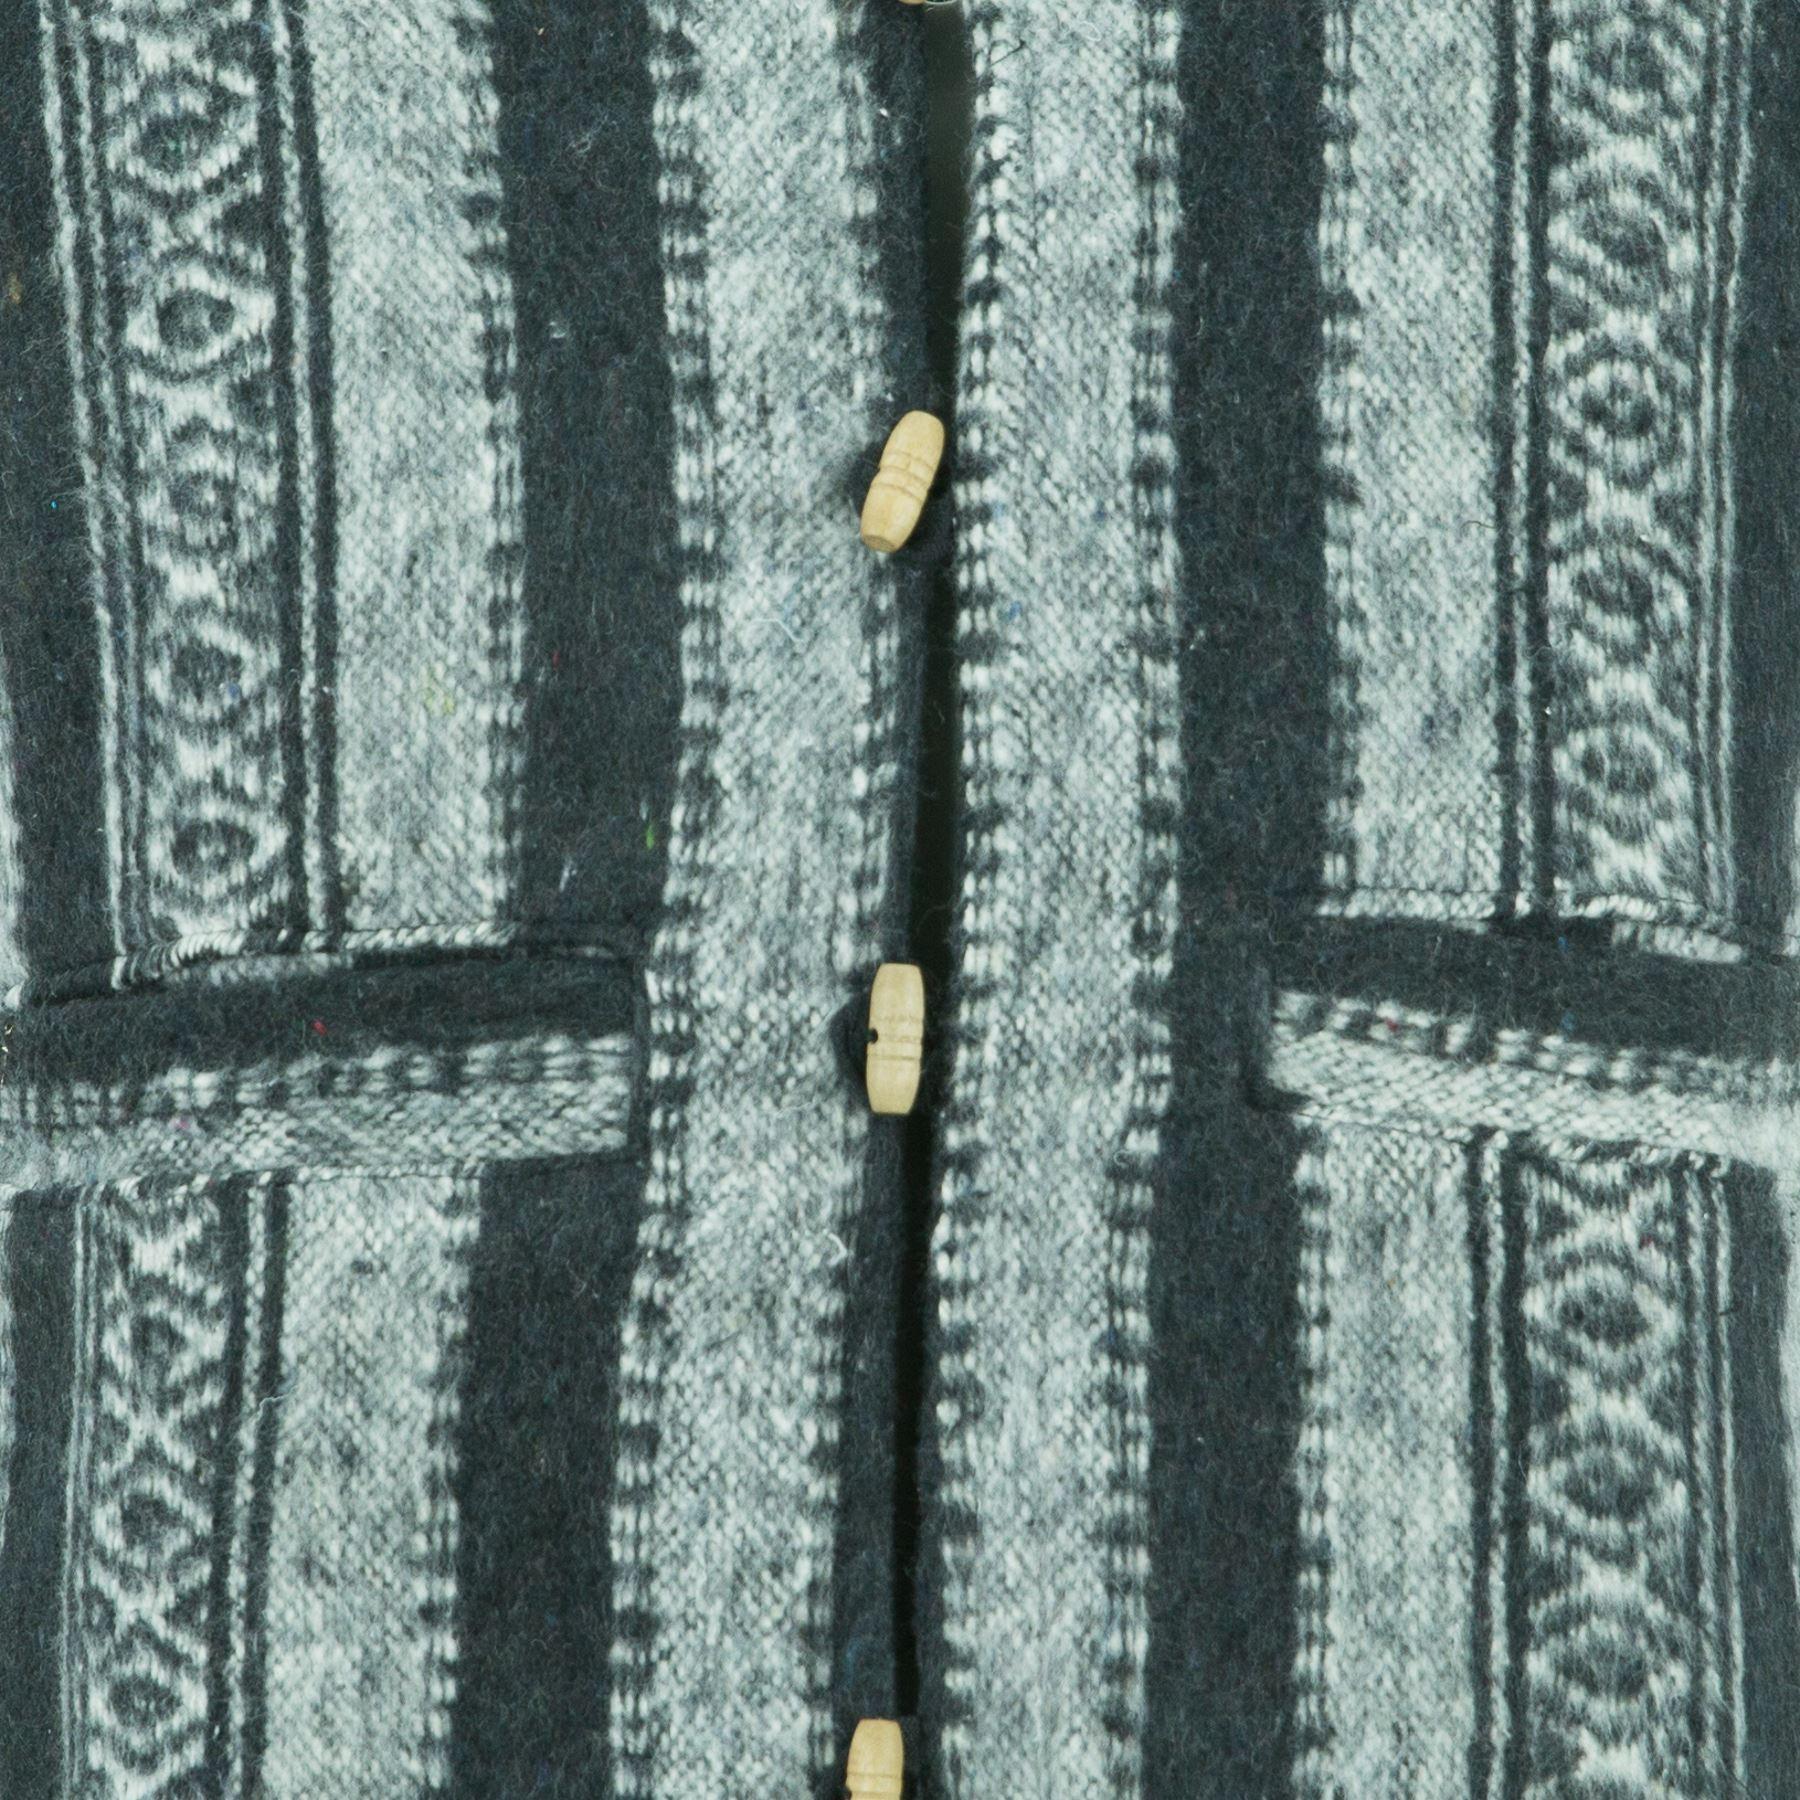 Chaleco-Algodon-Hombre-Perchado-Hippie-Boho-Traje-para-Hombre-Mujer miniatura 12